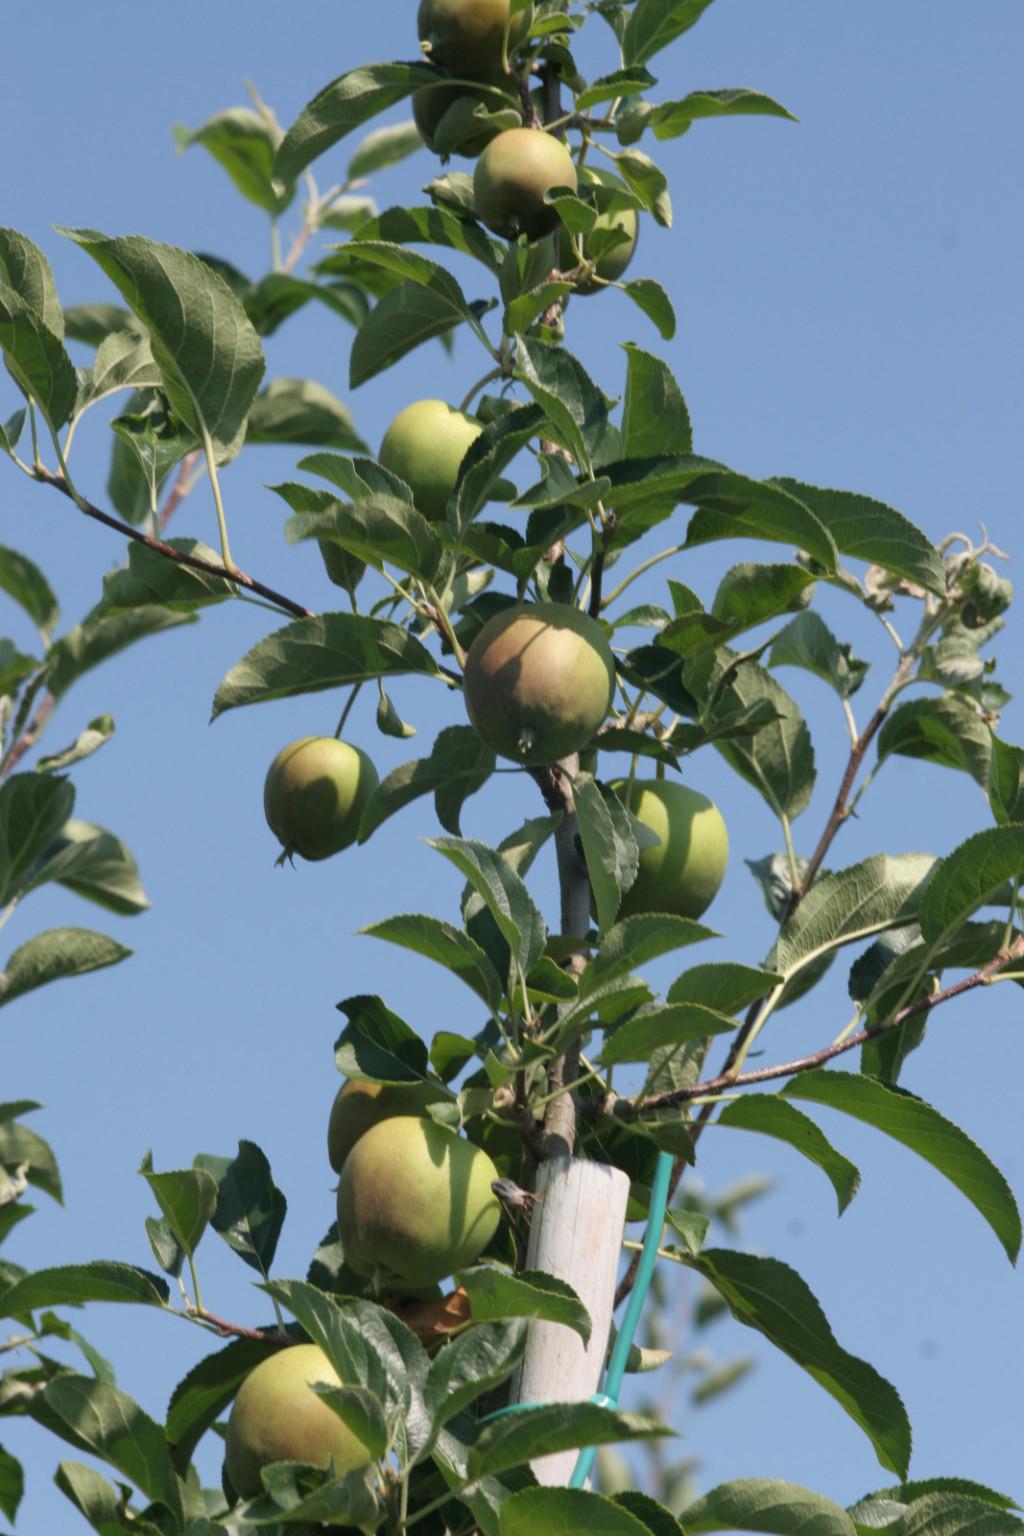 Umirjena uravnotežena rast na vrhu drevesa.